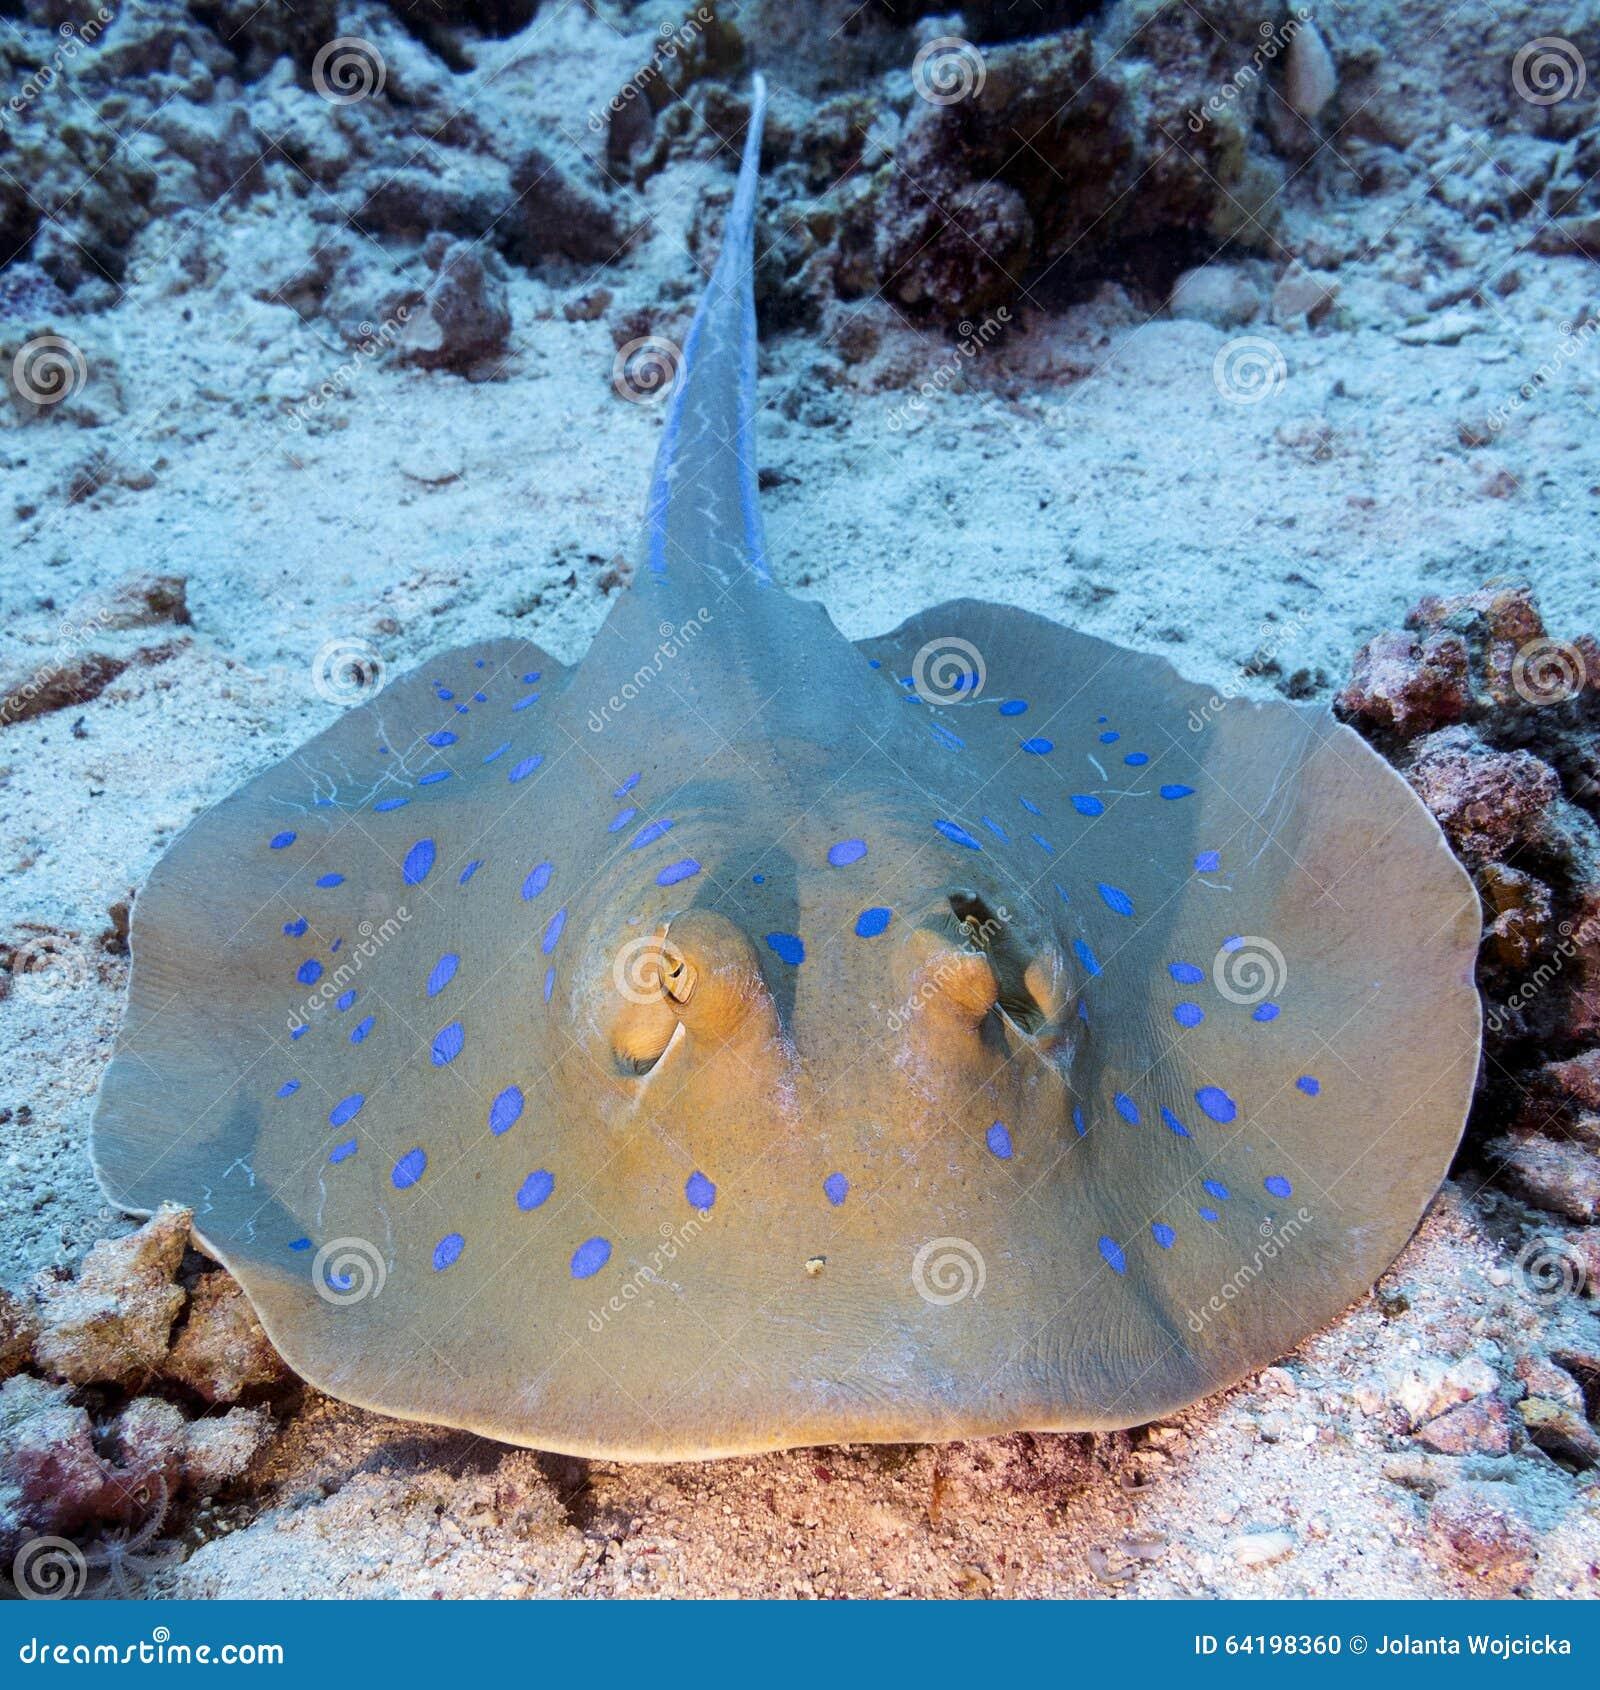 Bluespotted光芒(Taeniura lymma)在热带海,水下